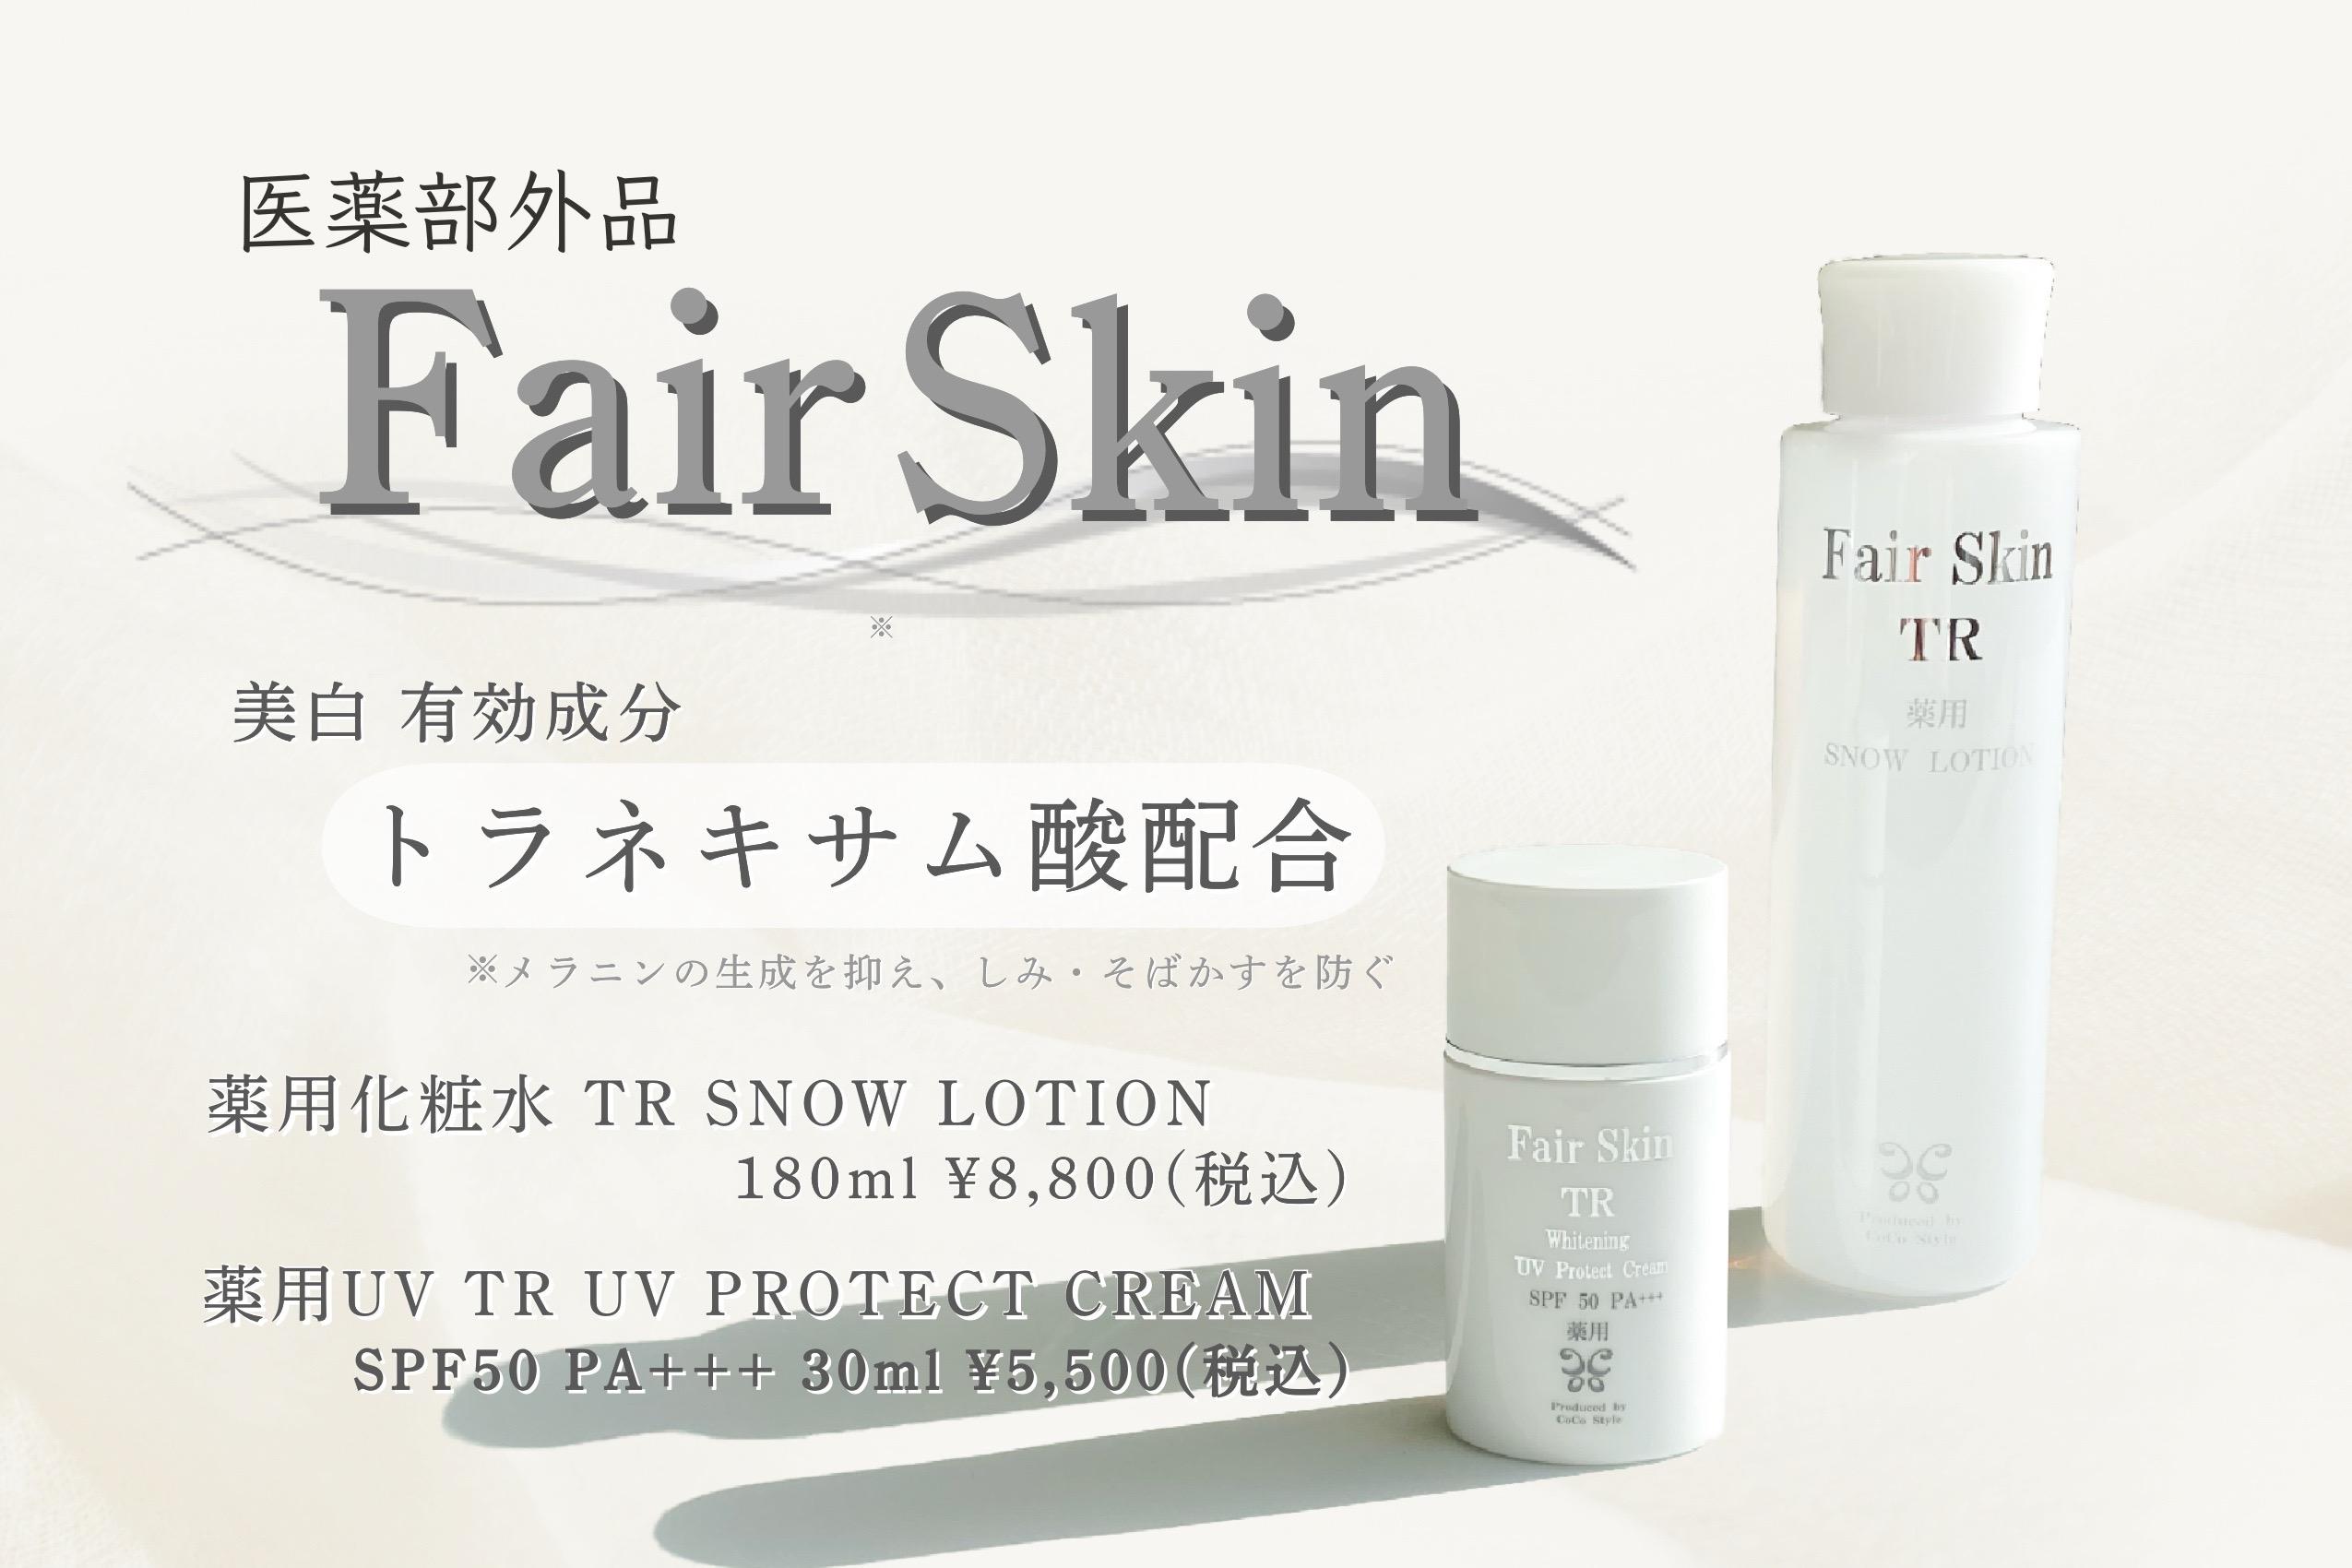 FairSkin